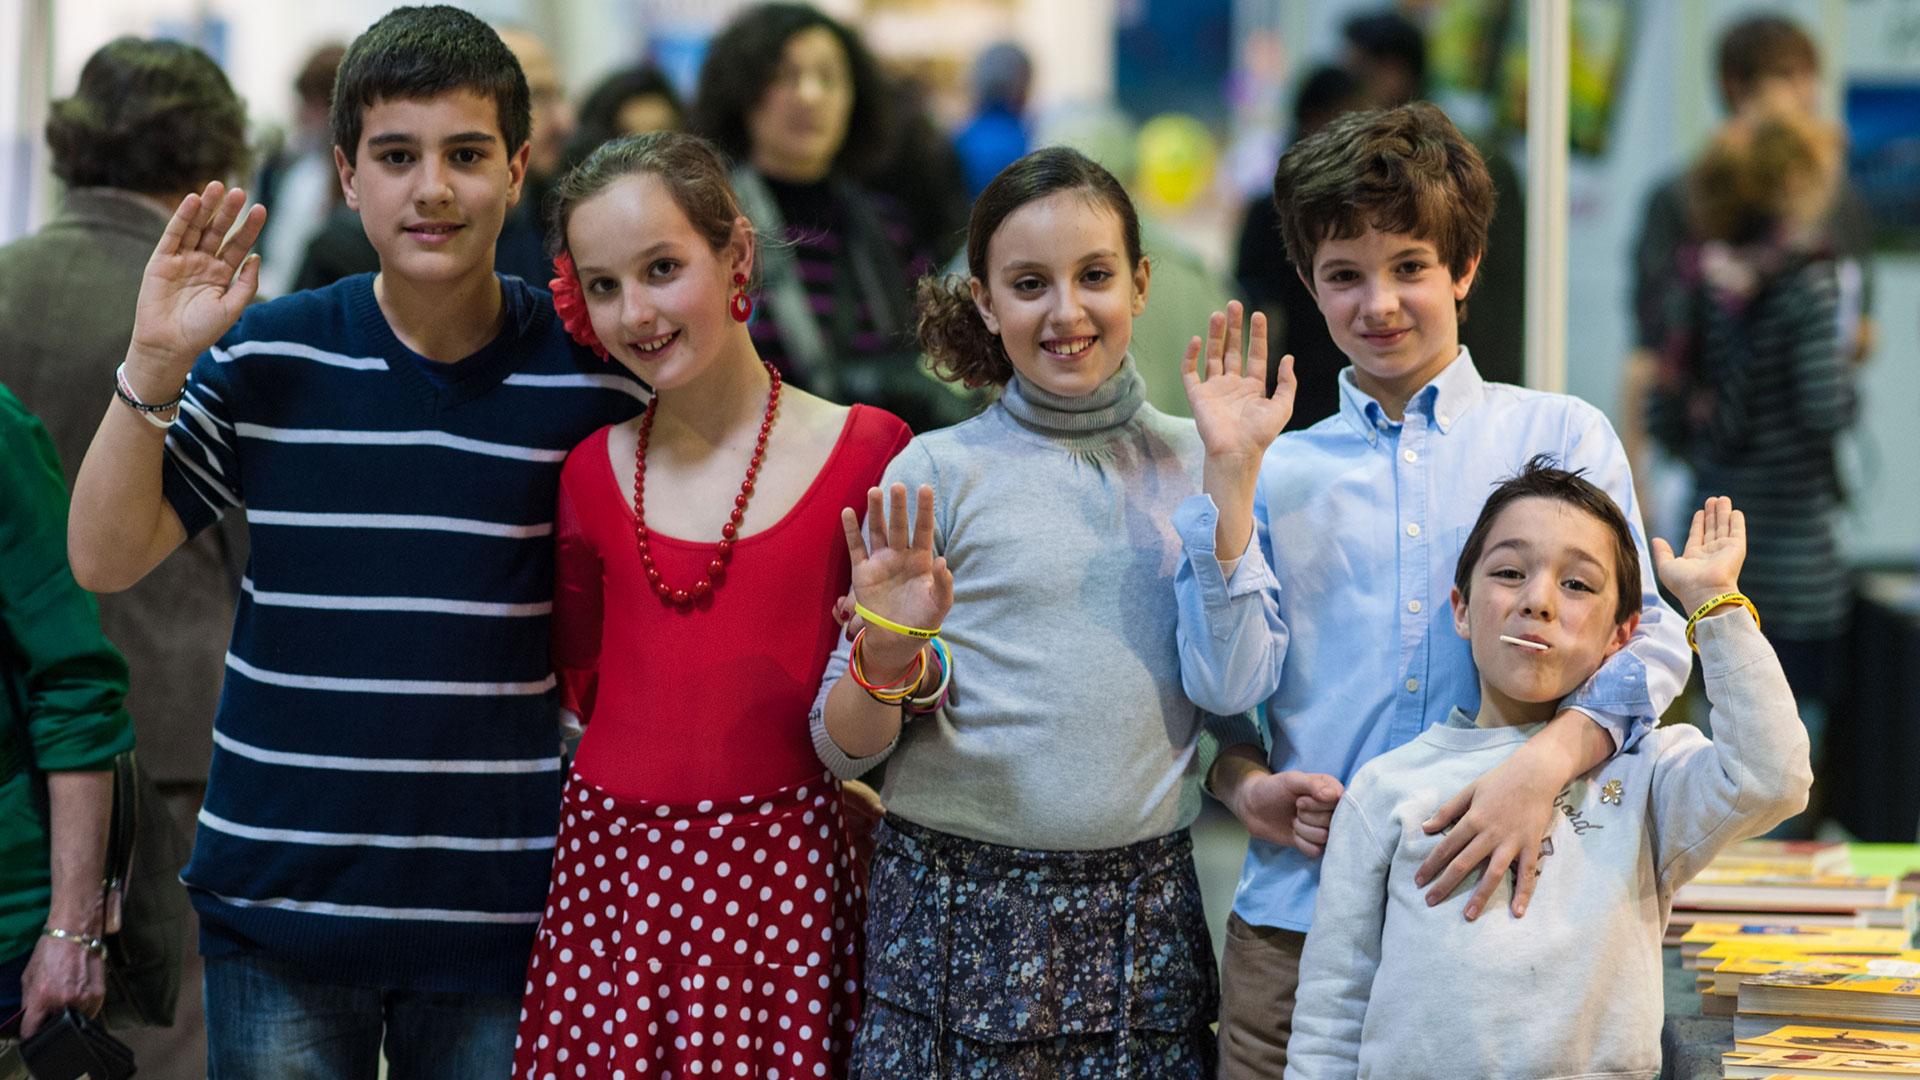 paulo-lobo-enfants-festival-clae-2014